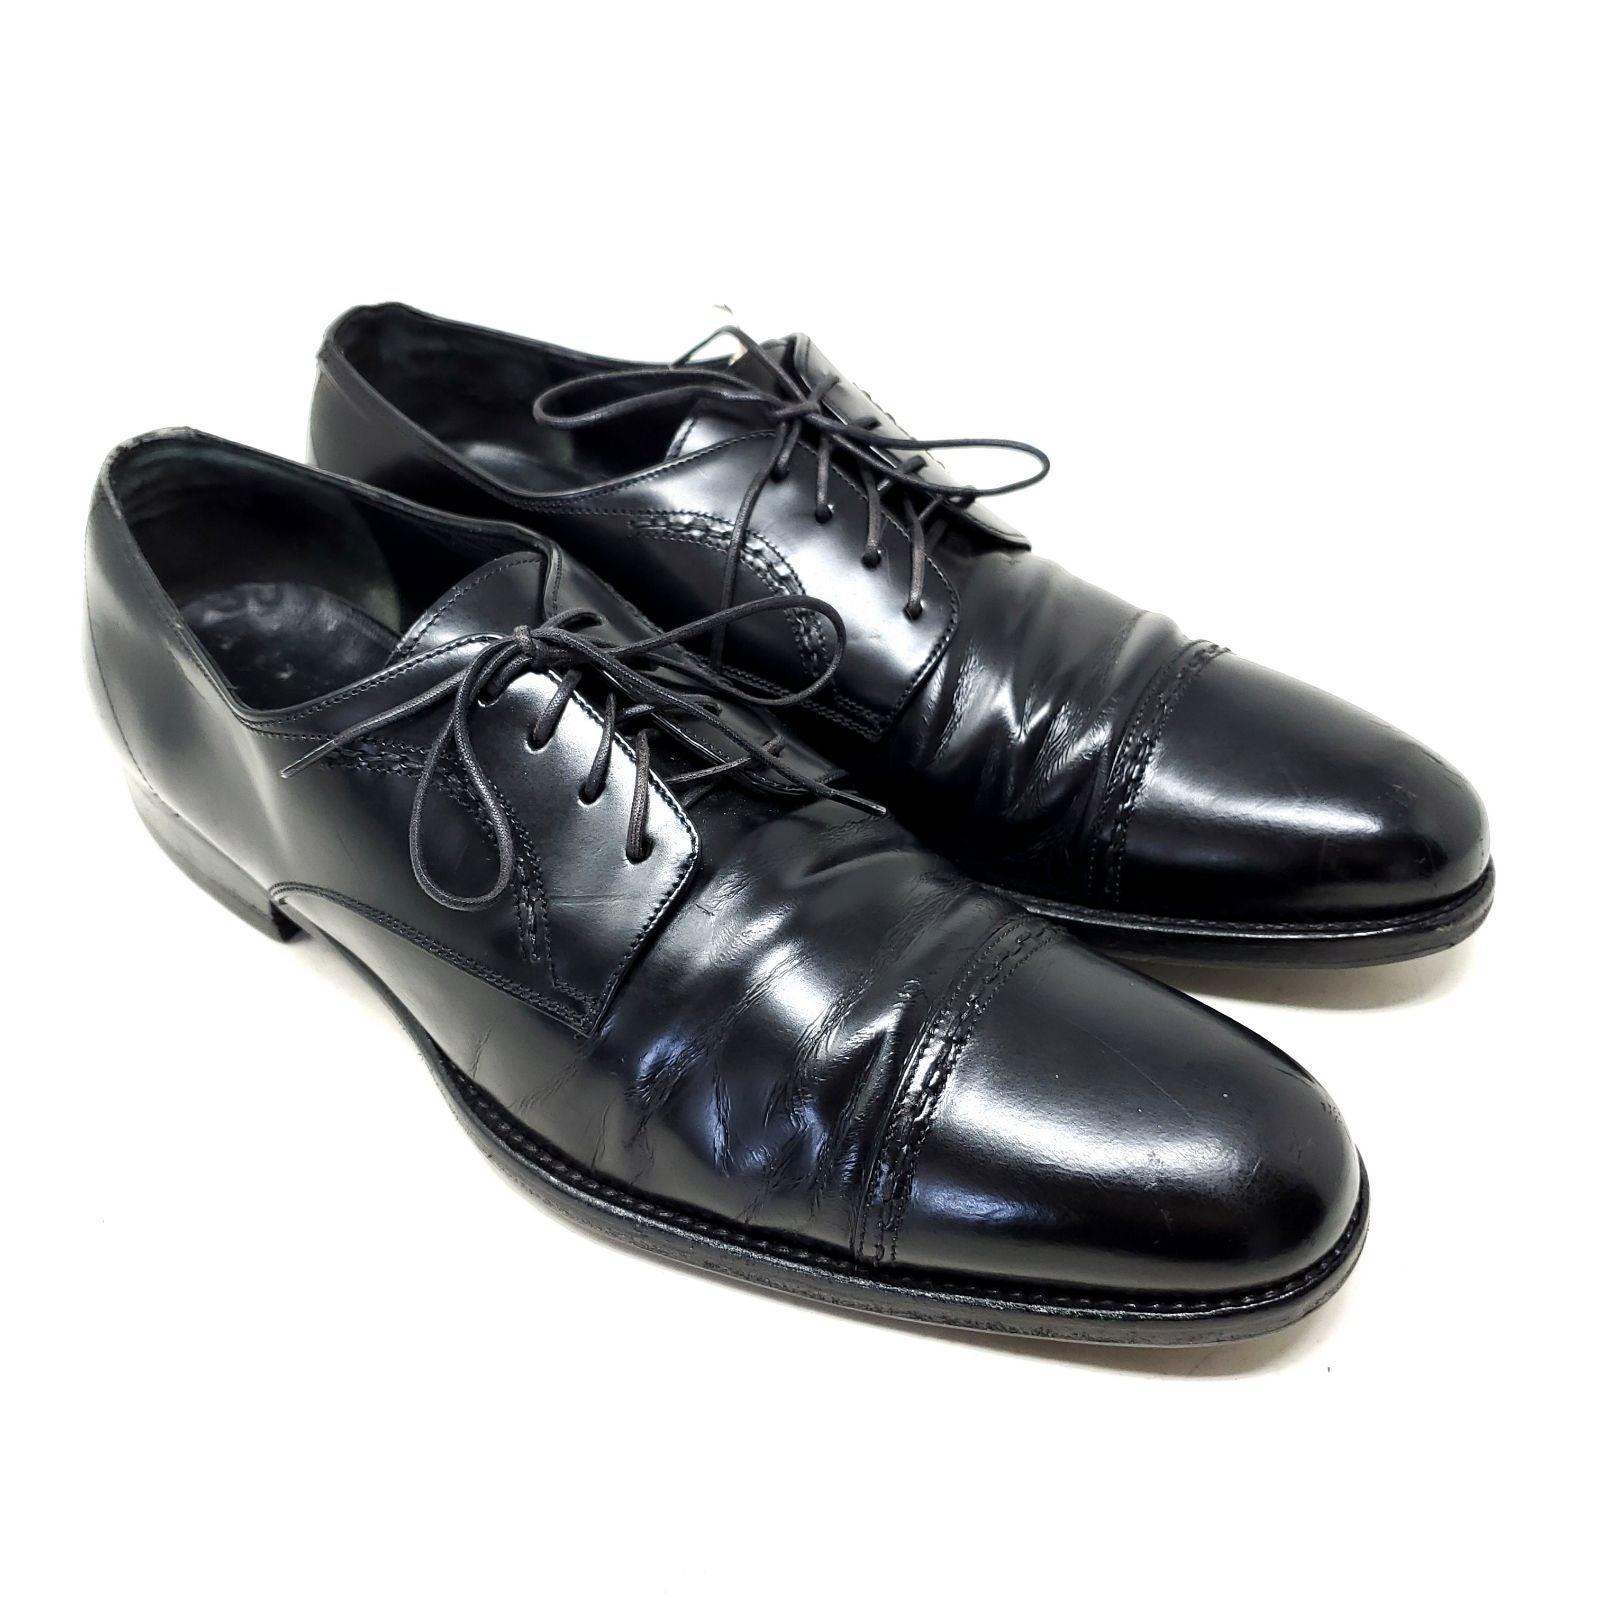 Salvatore Ferragano Black Leather Shoes